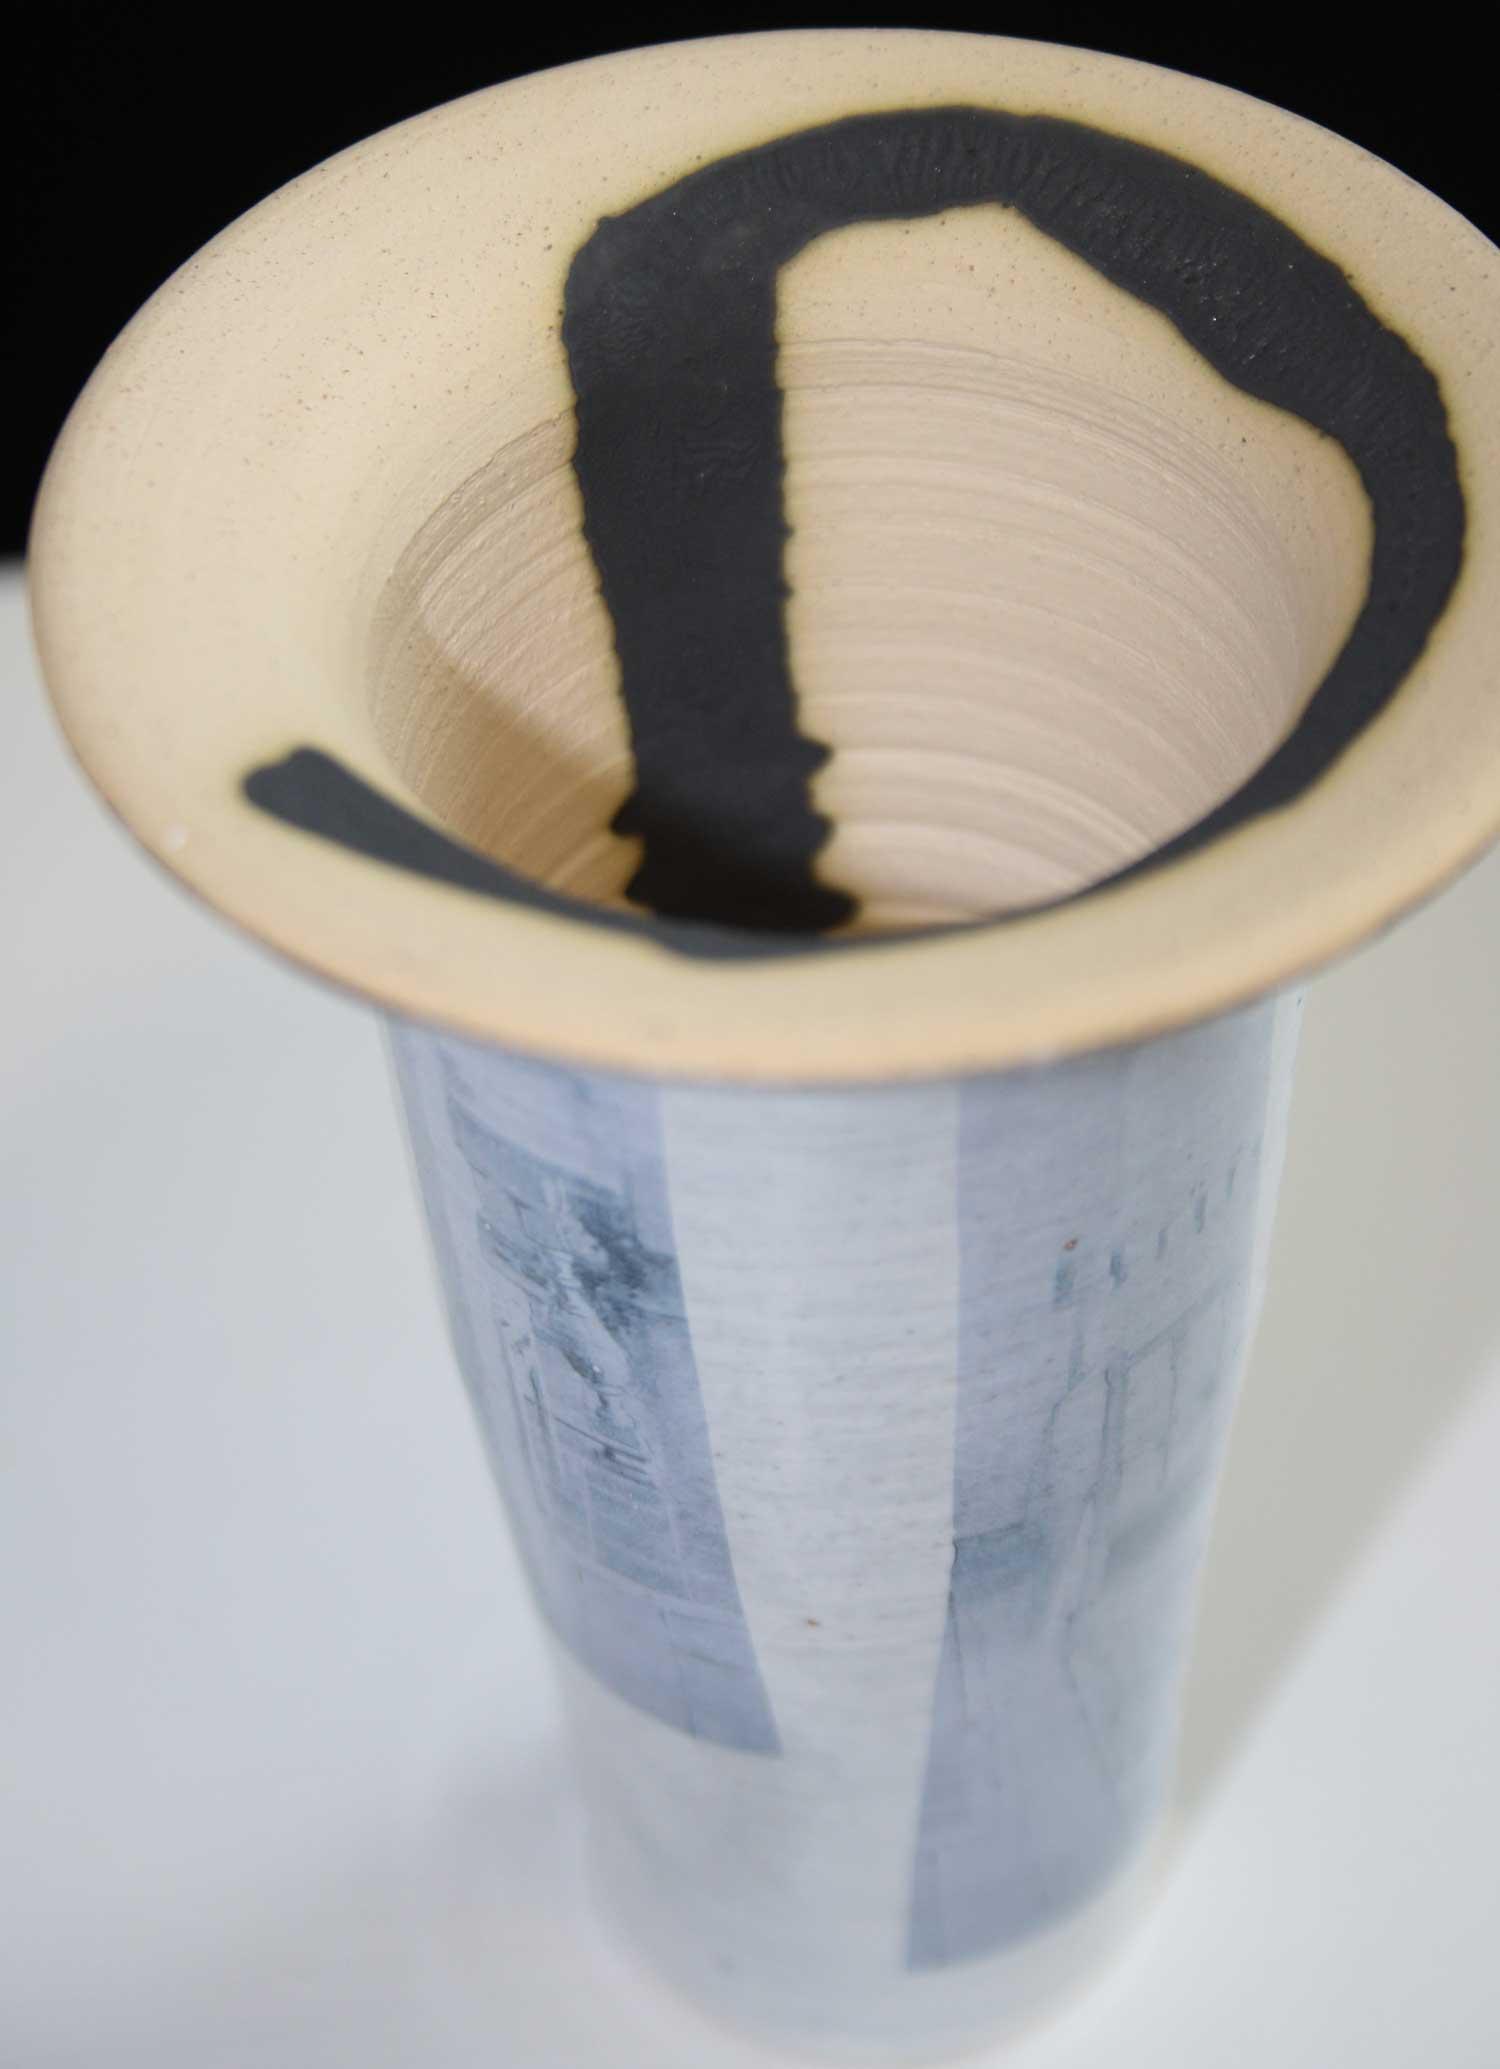 Gormenghast vase